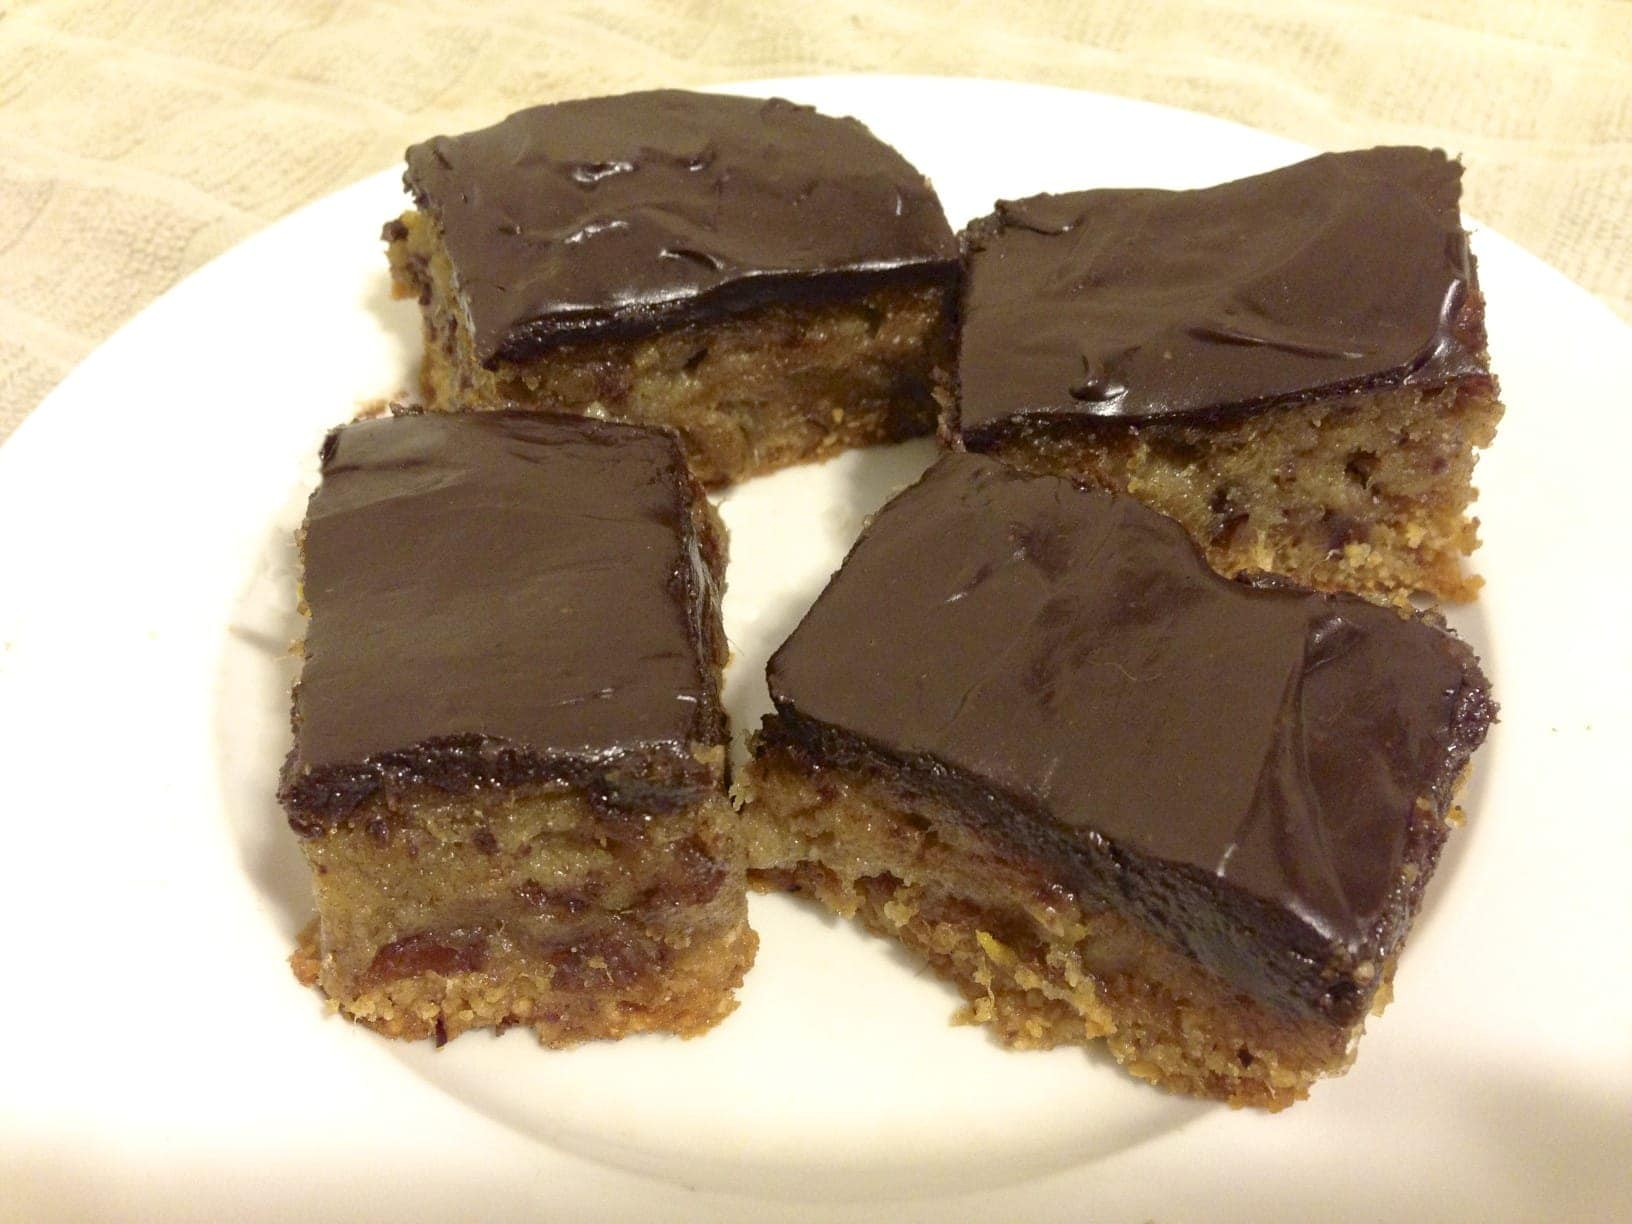 paleo:primal chocolate, date and orange bars